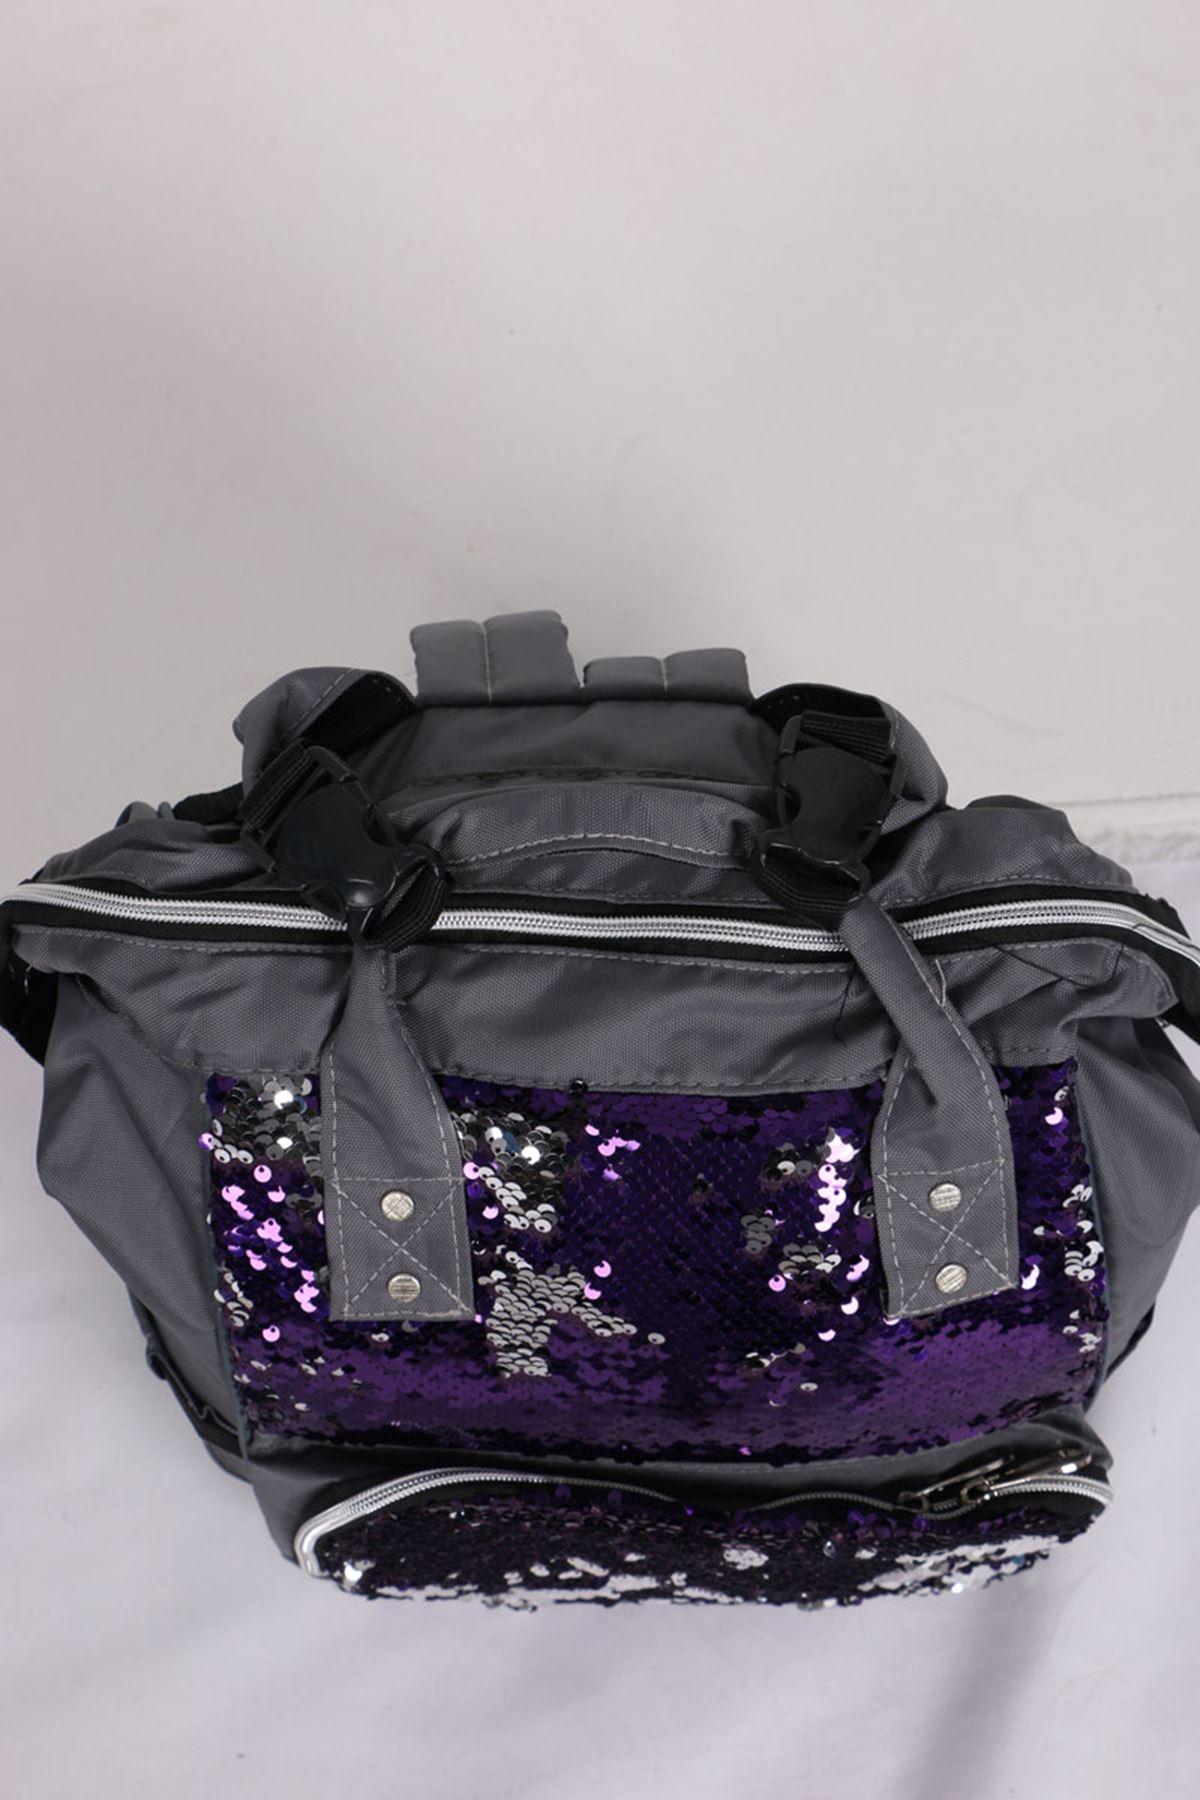 19033 Functional Mother Baby Bag- Purple